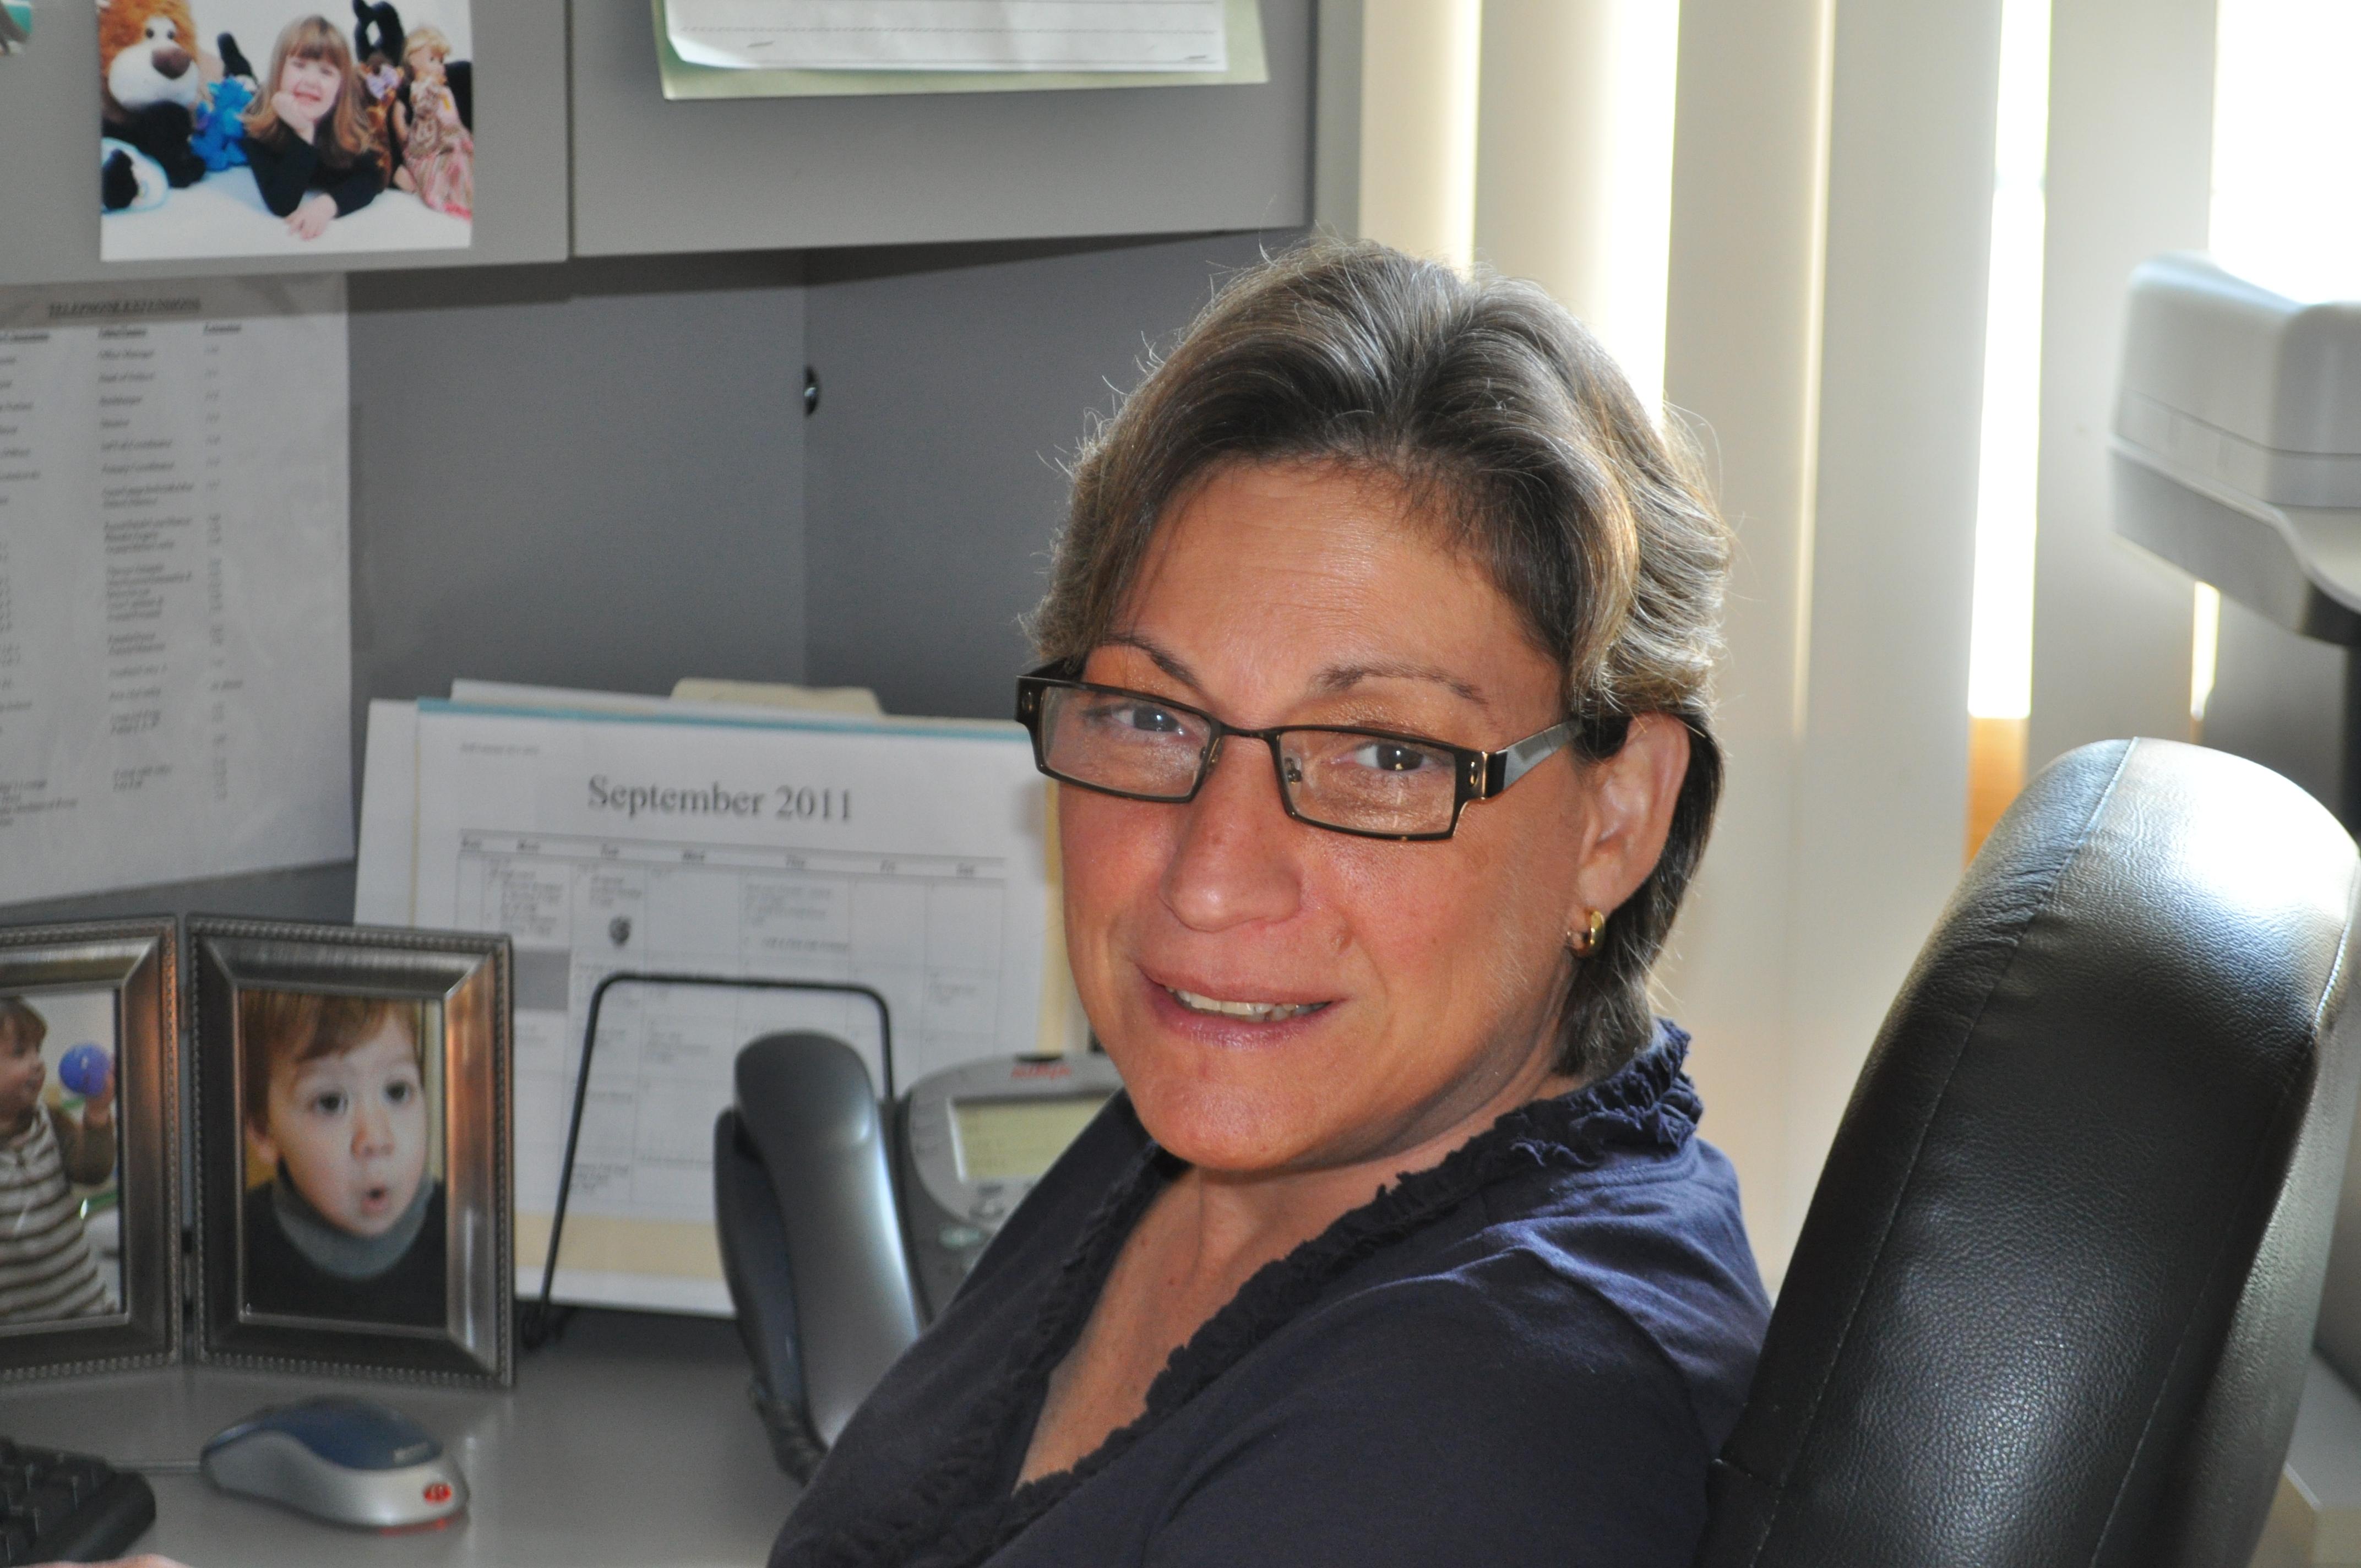 Carmela DiBlasi